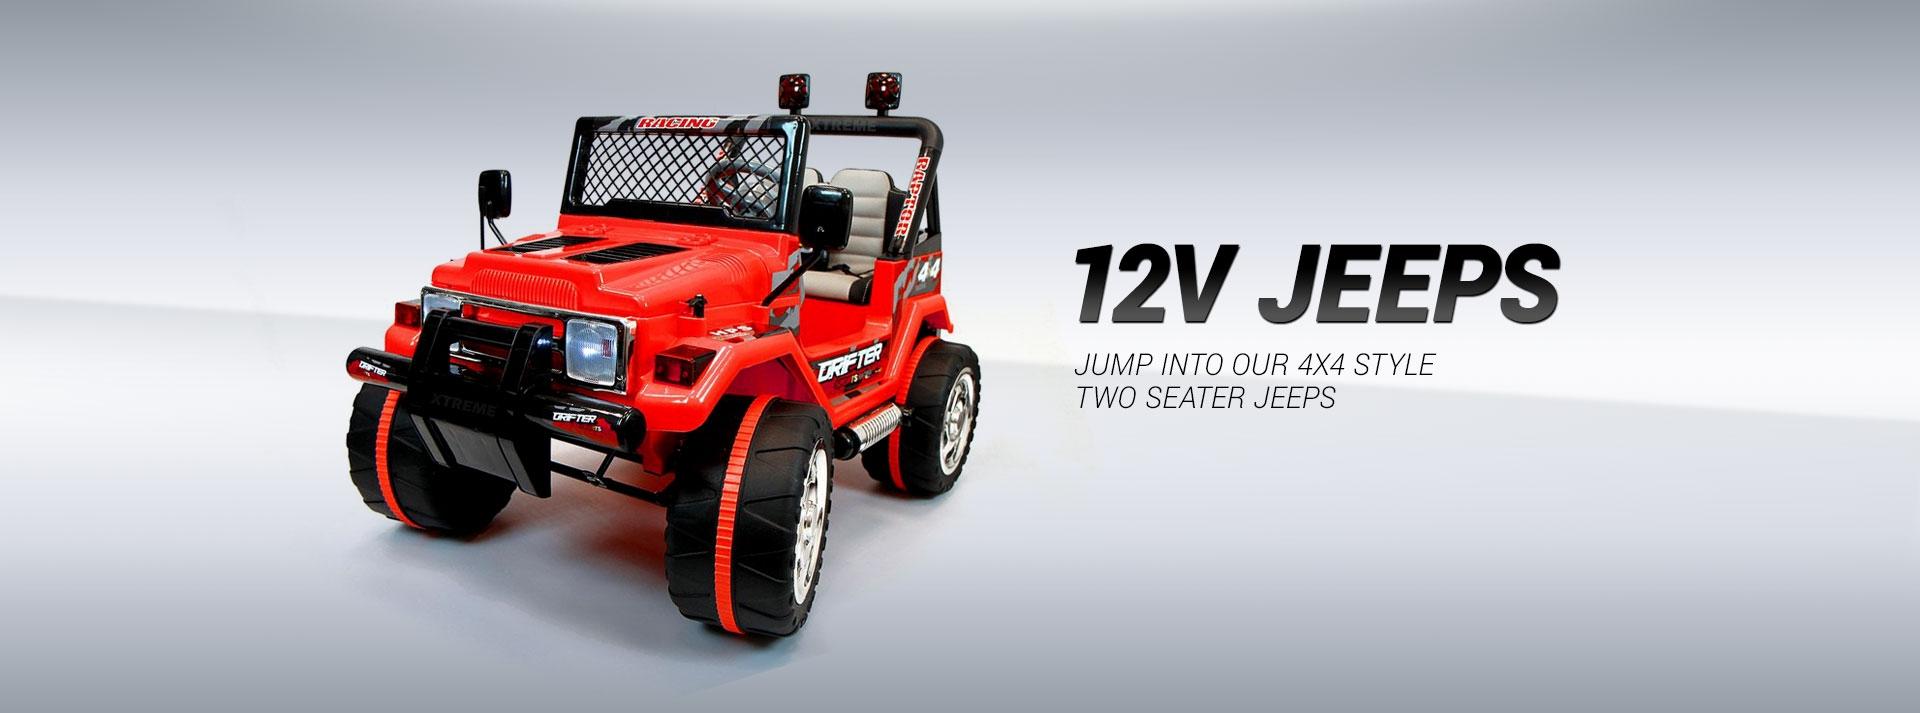 12V Jeeps